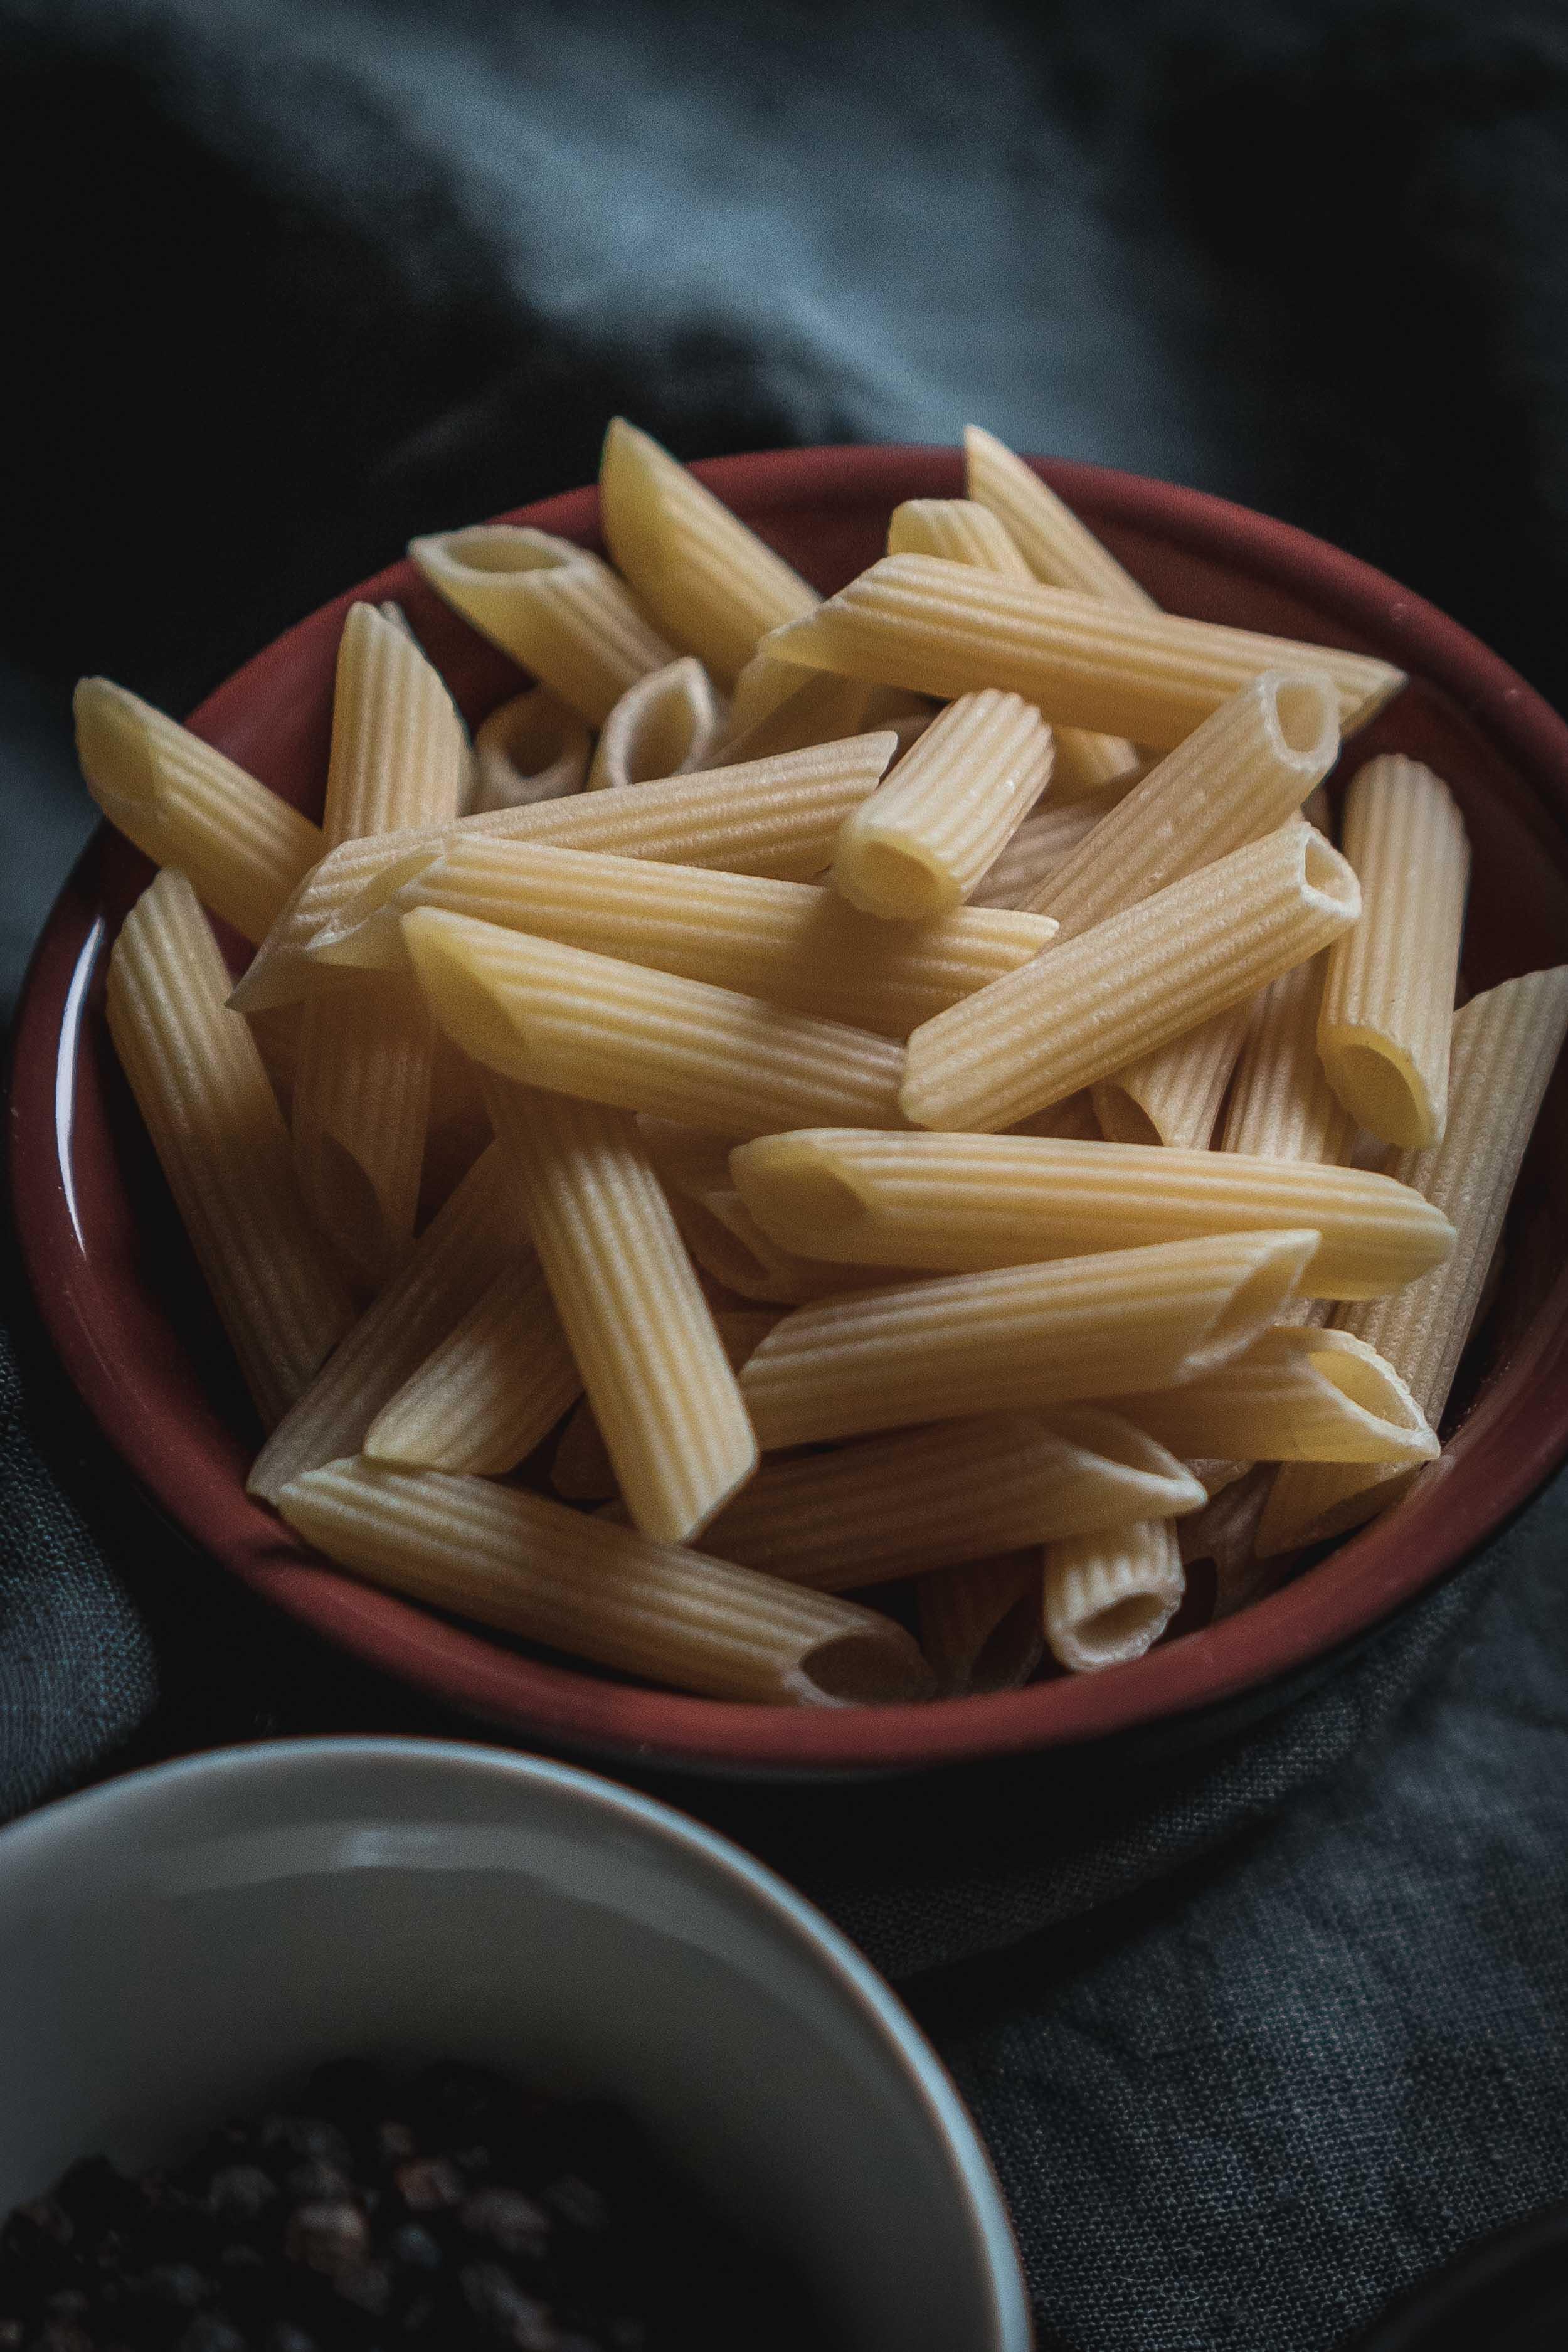 Asparagus-and-Bacon-Penne-Pasta-05119.jpg